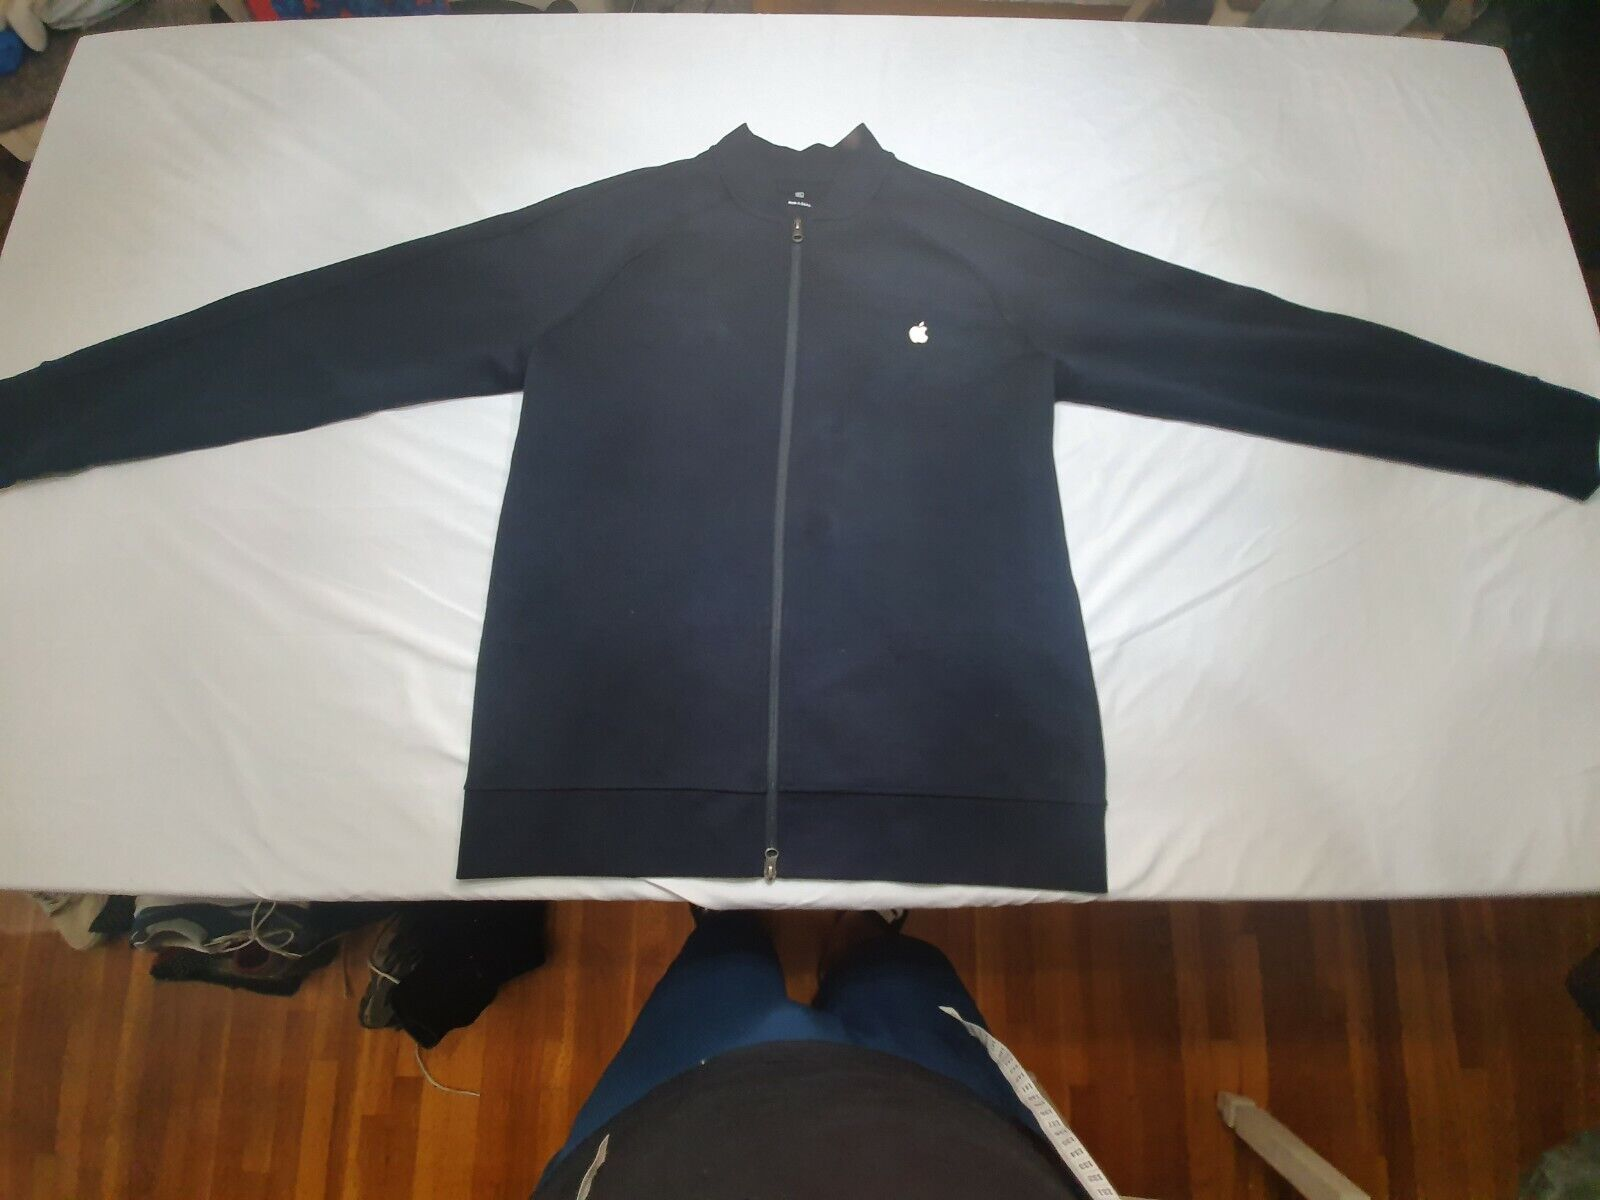 Apple Store Employee Mens Full Zip Sweatshirt/Jacket Embroidered Extra Large XL